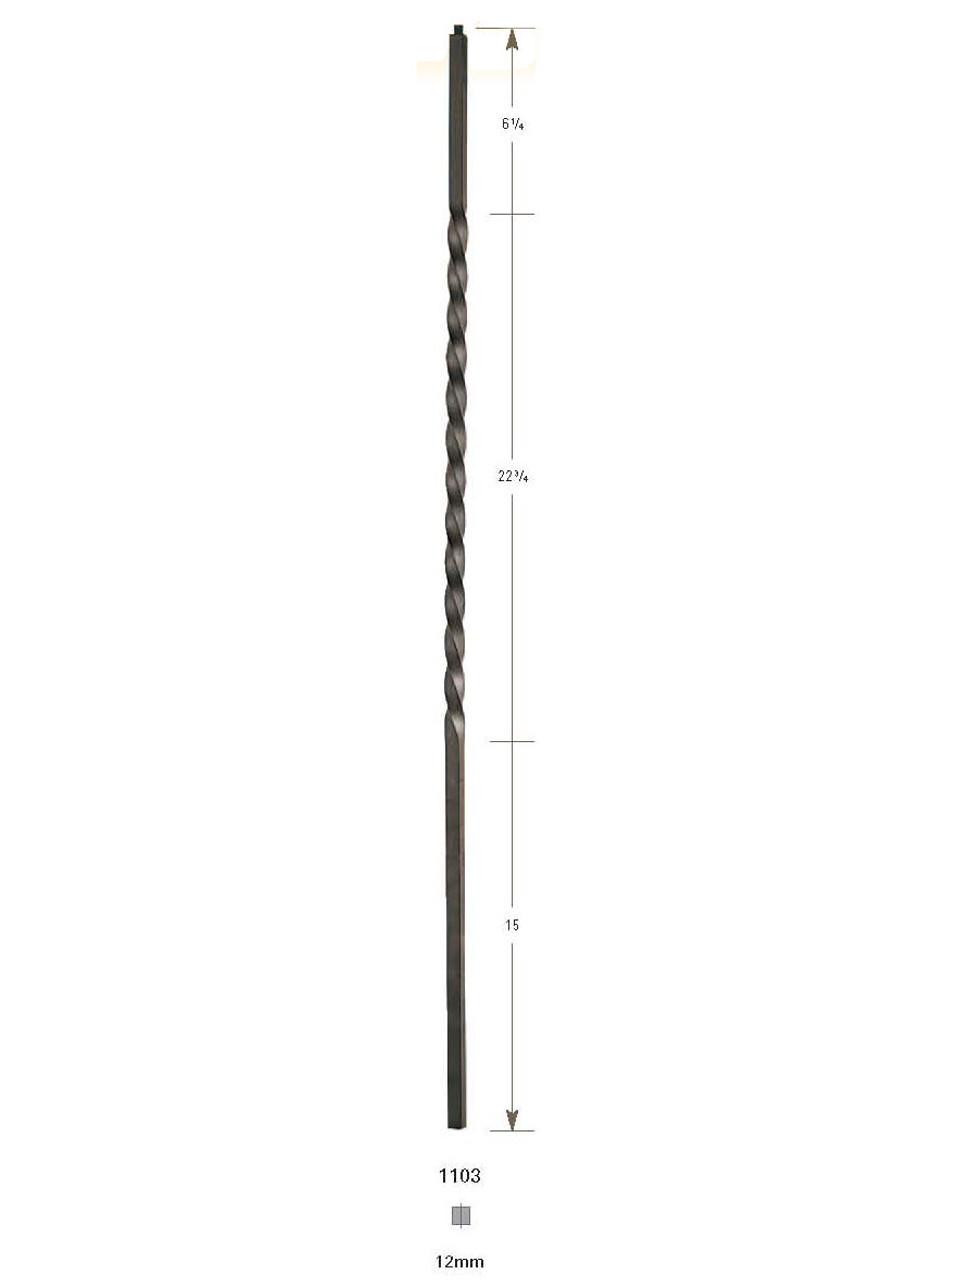 1103 Long Twist Iron Baluster